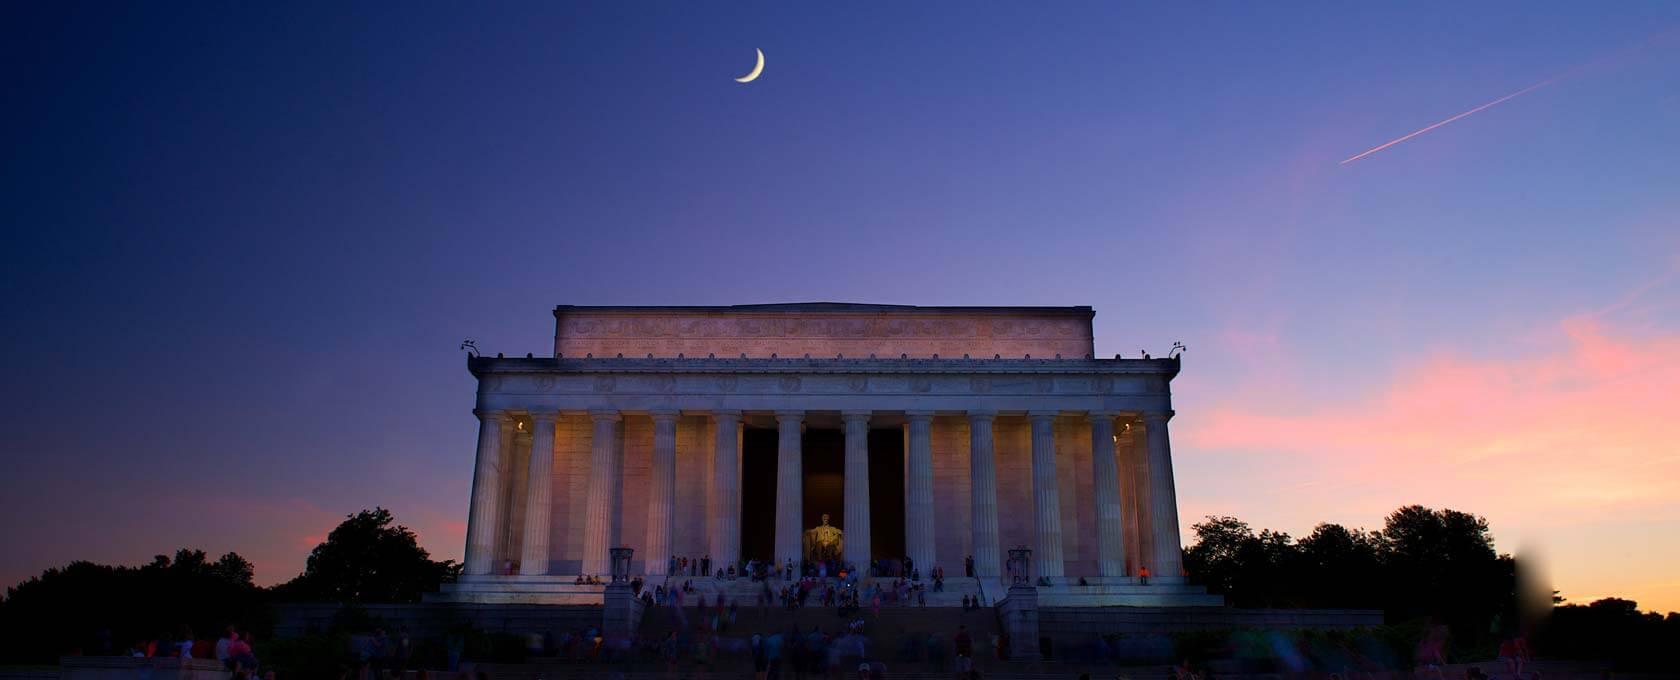 Washington DC monument at night